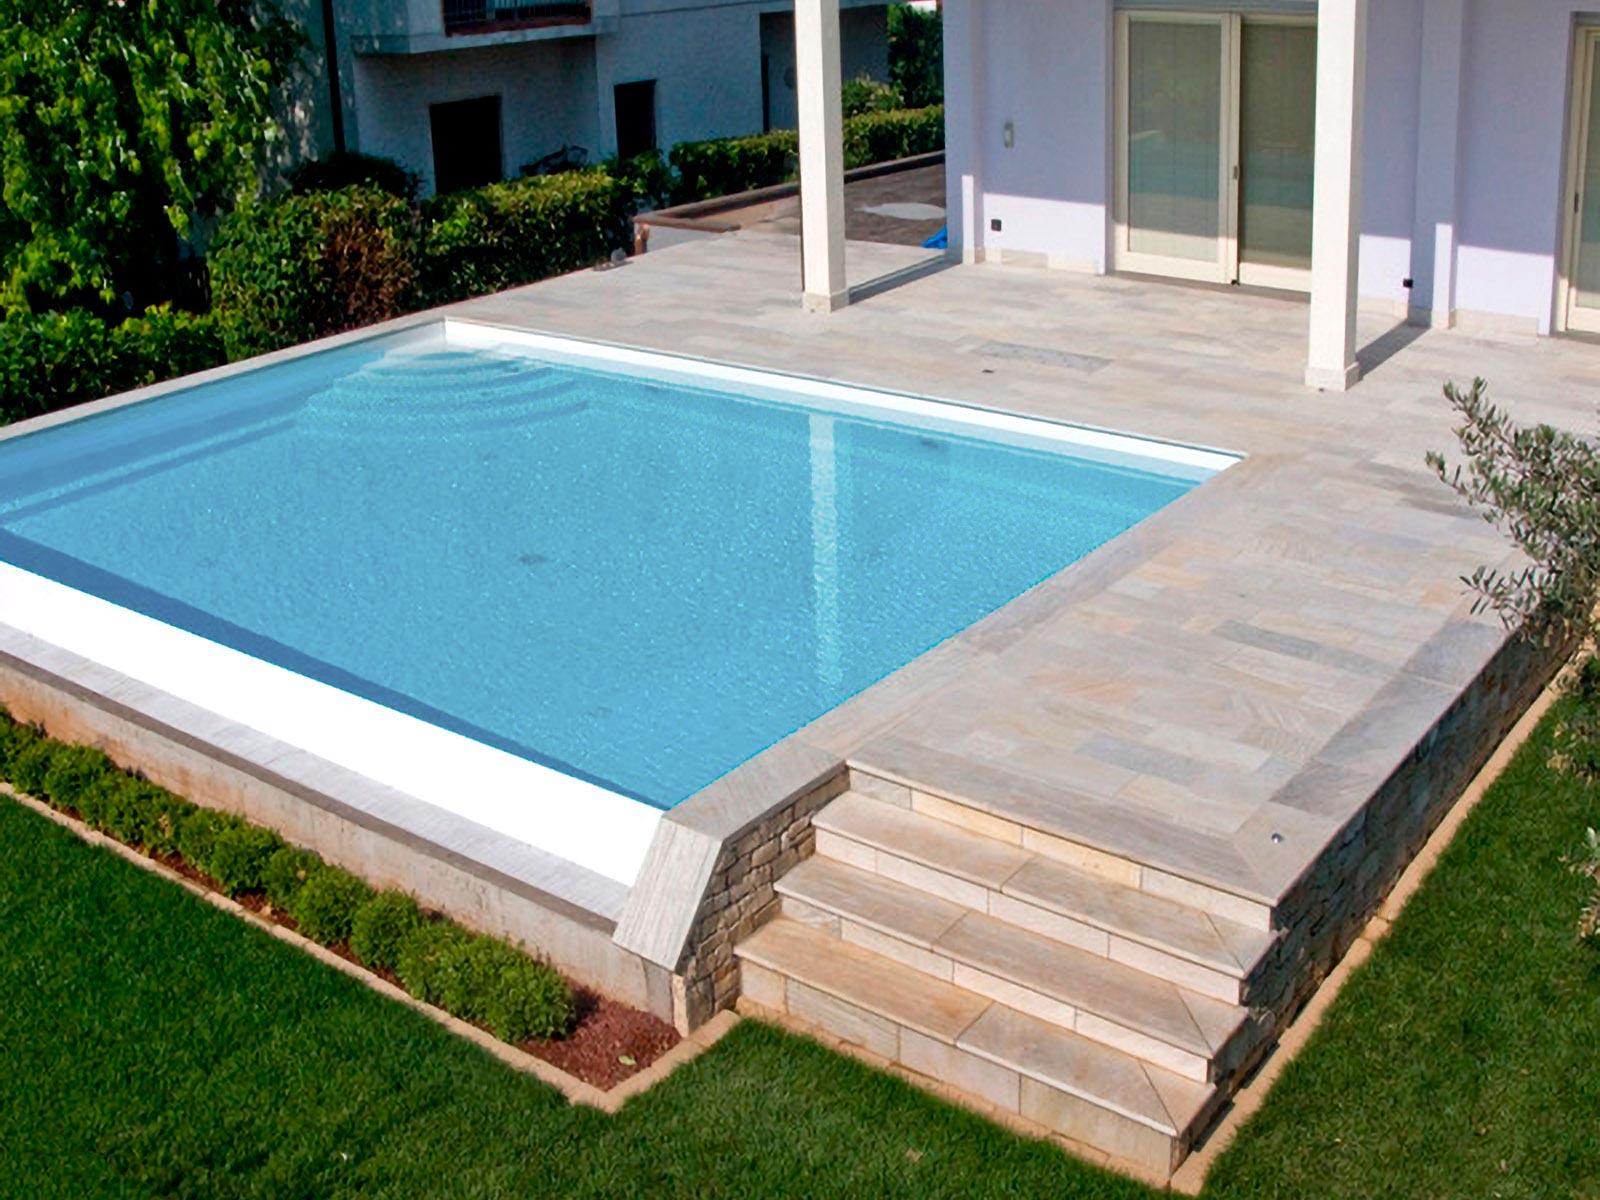 [40] Variazioni di bianchi su blu - abitazioni, piscine, quarzite, quarzite bianca, lastricato, rivestimenti a massello